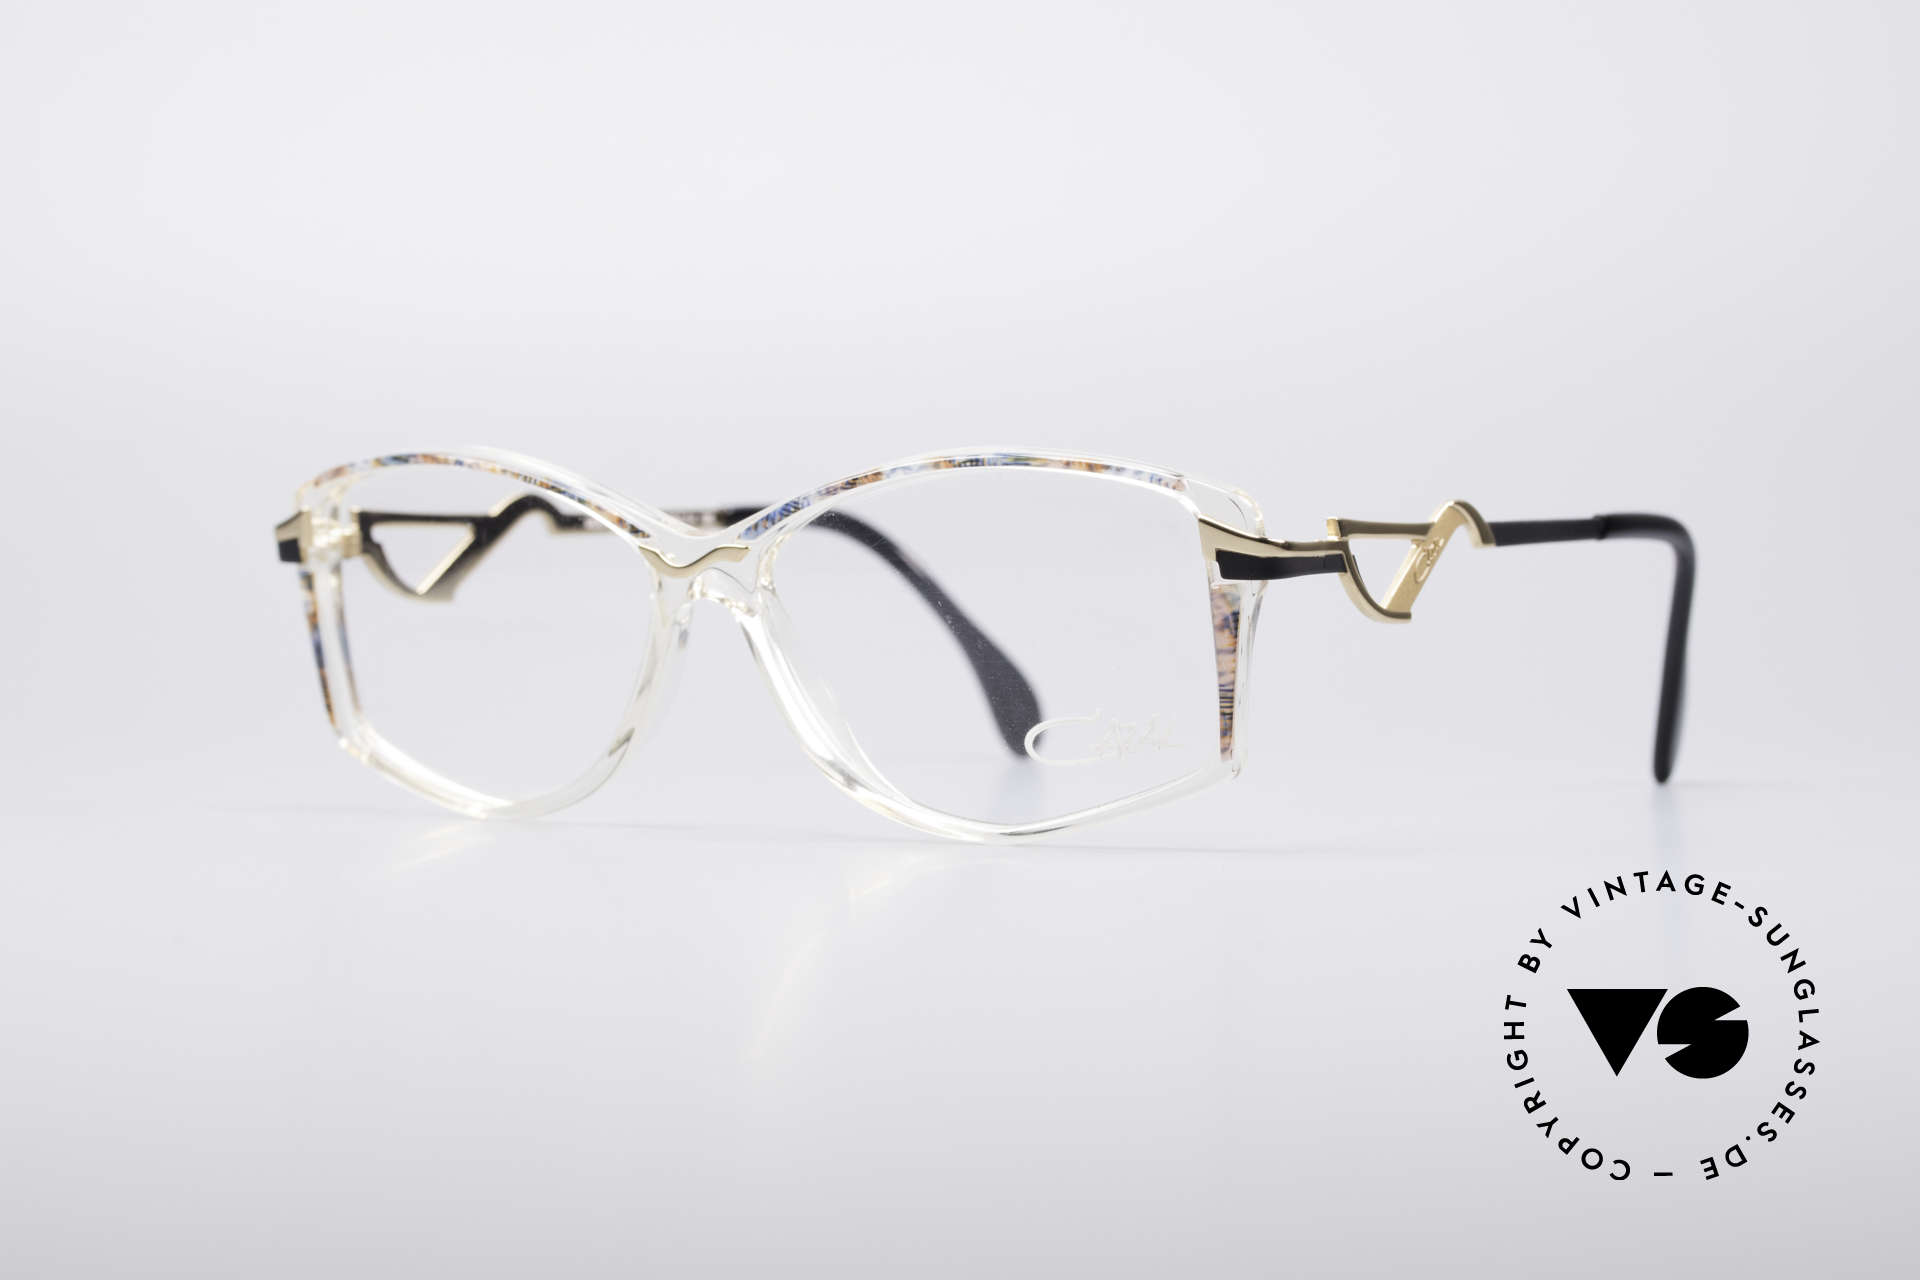 Cazal 369 90's Ladies Designer Glasses, striking temples & brilliant combination of materials, Made for Women